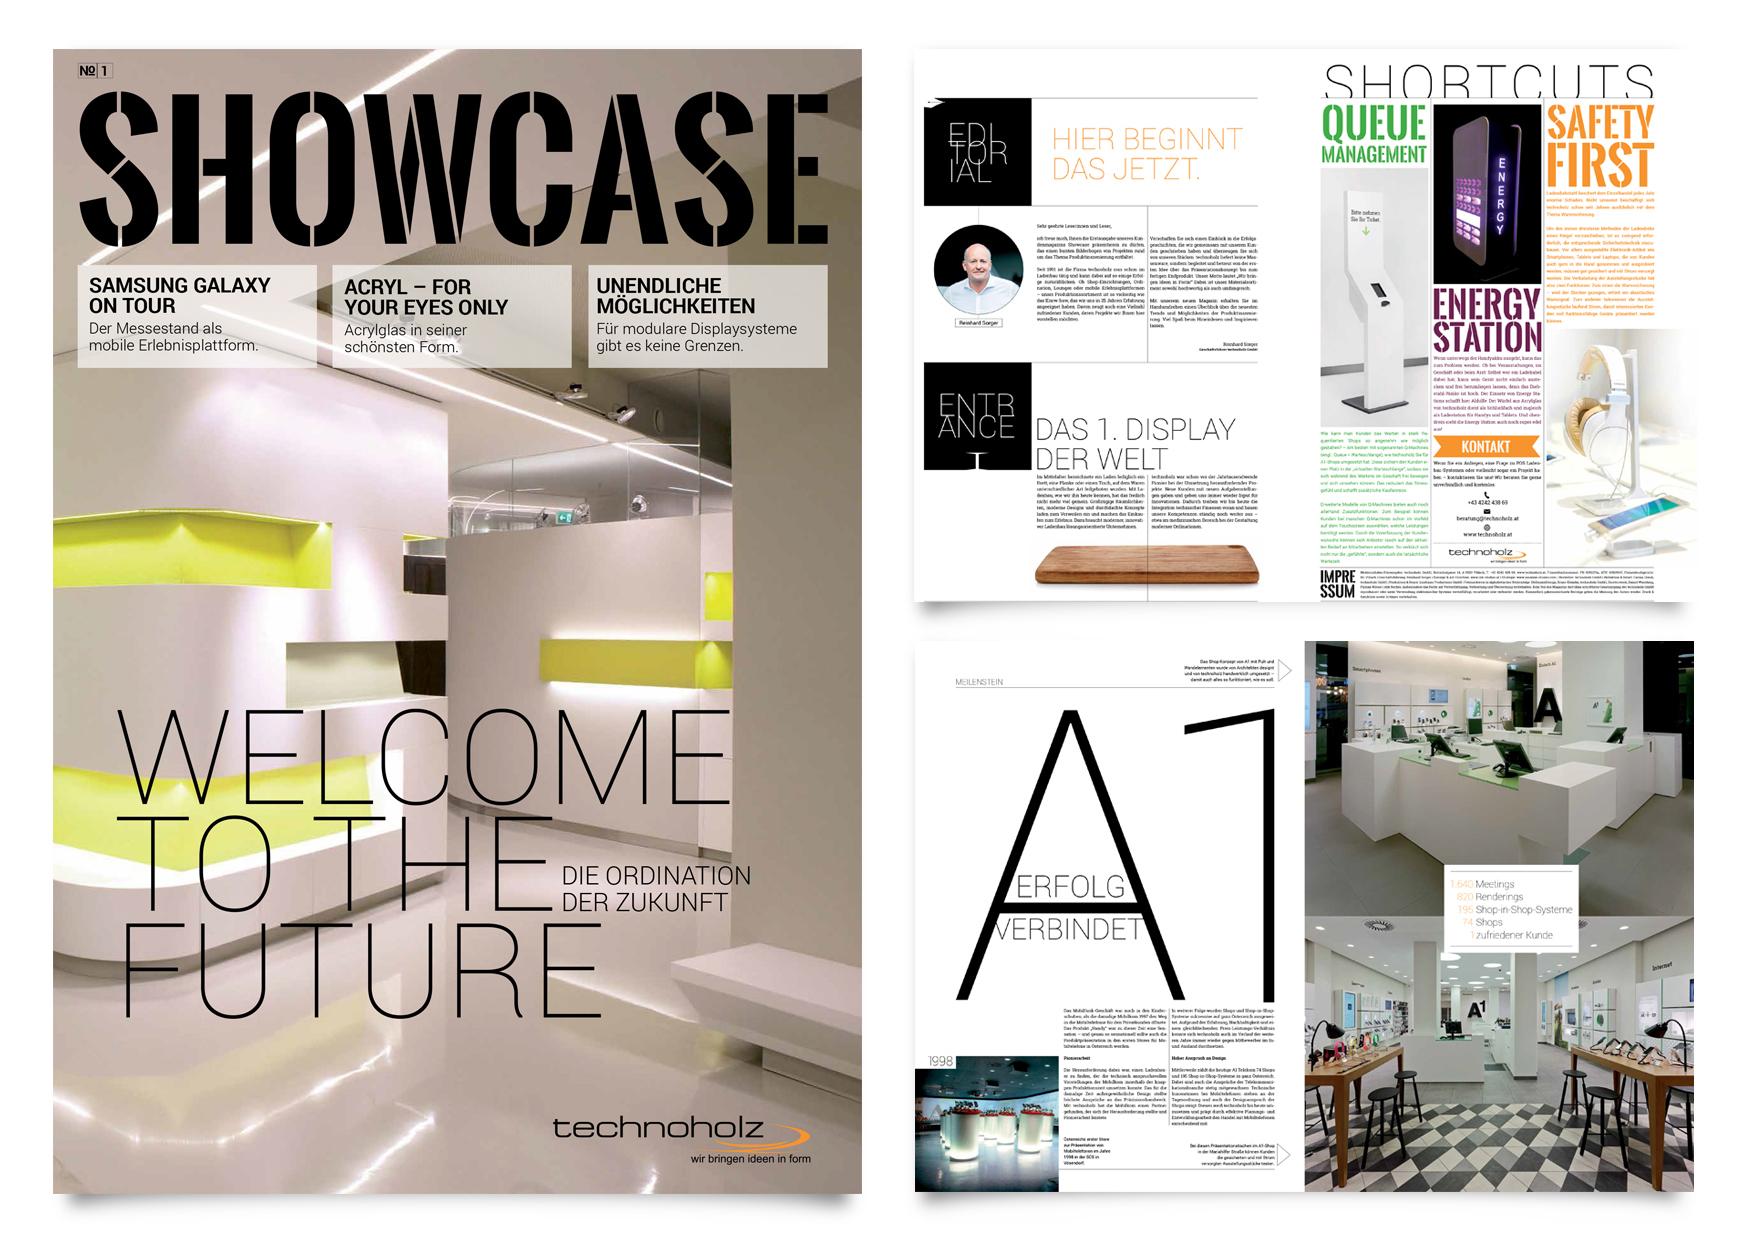 Showcase_F1.jpg